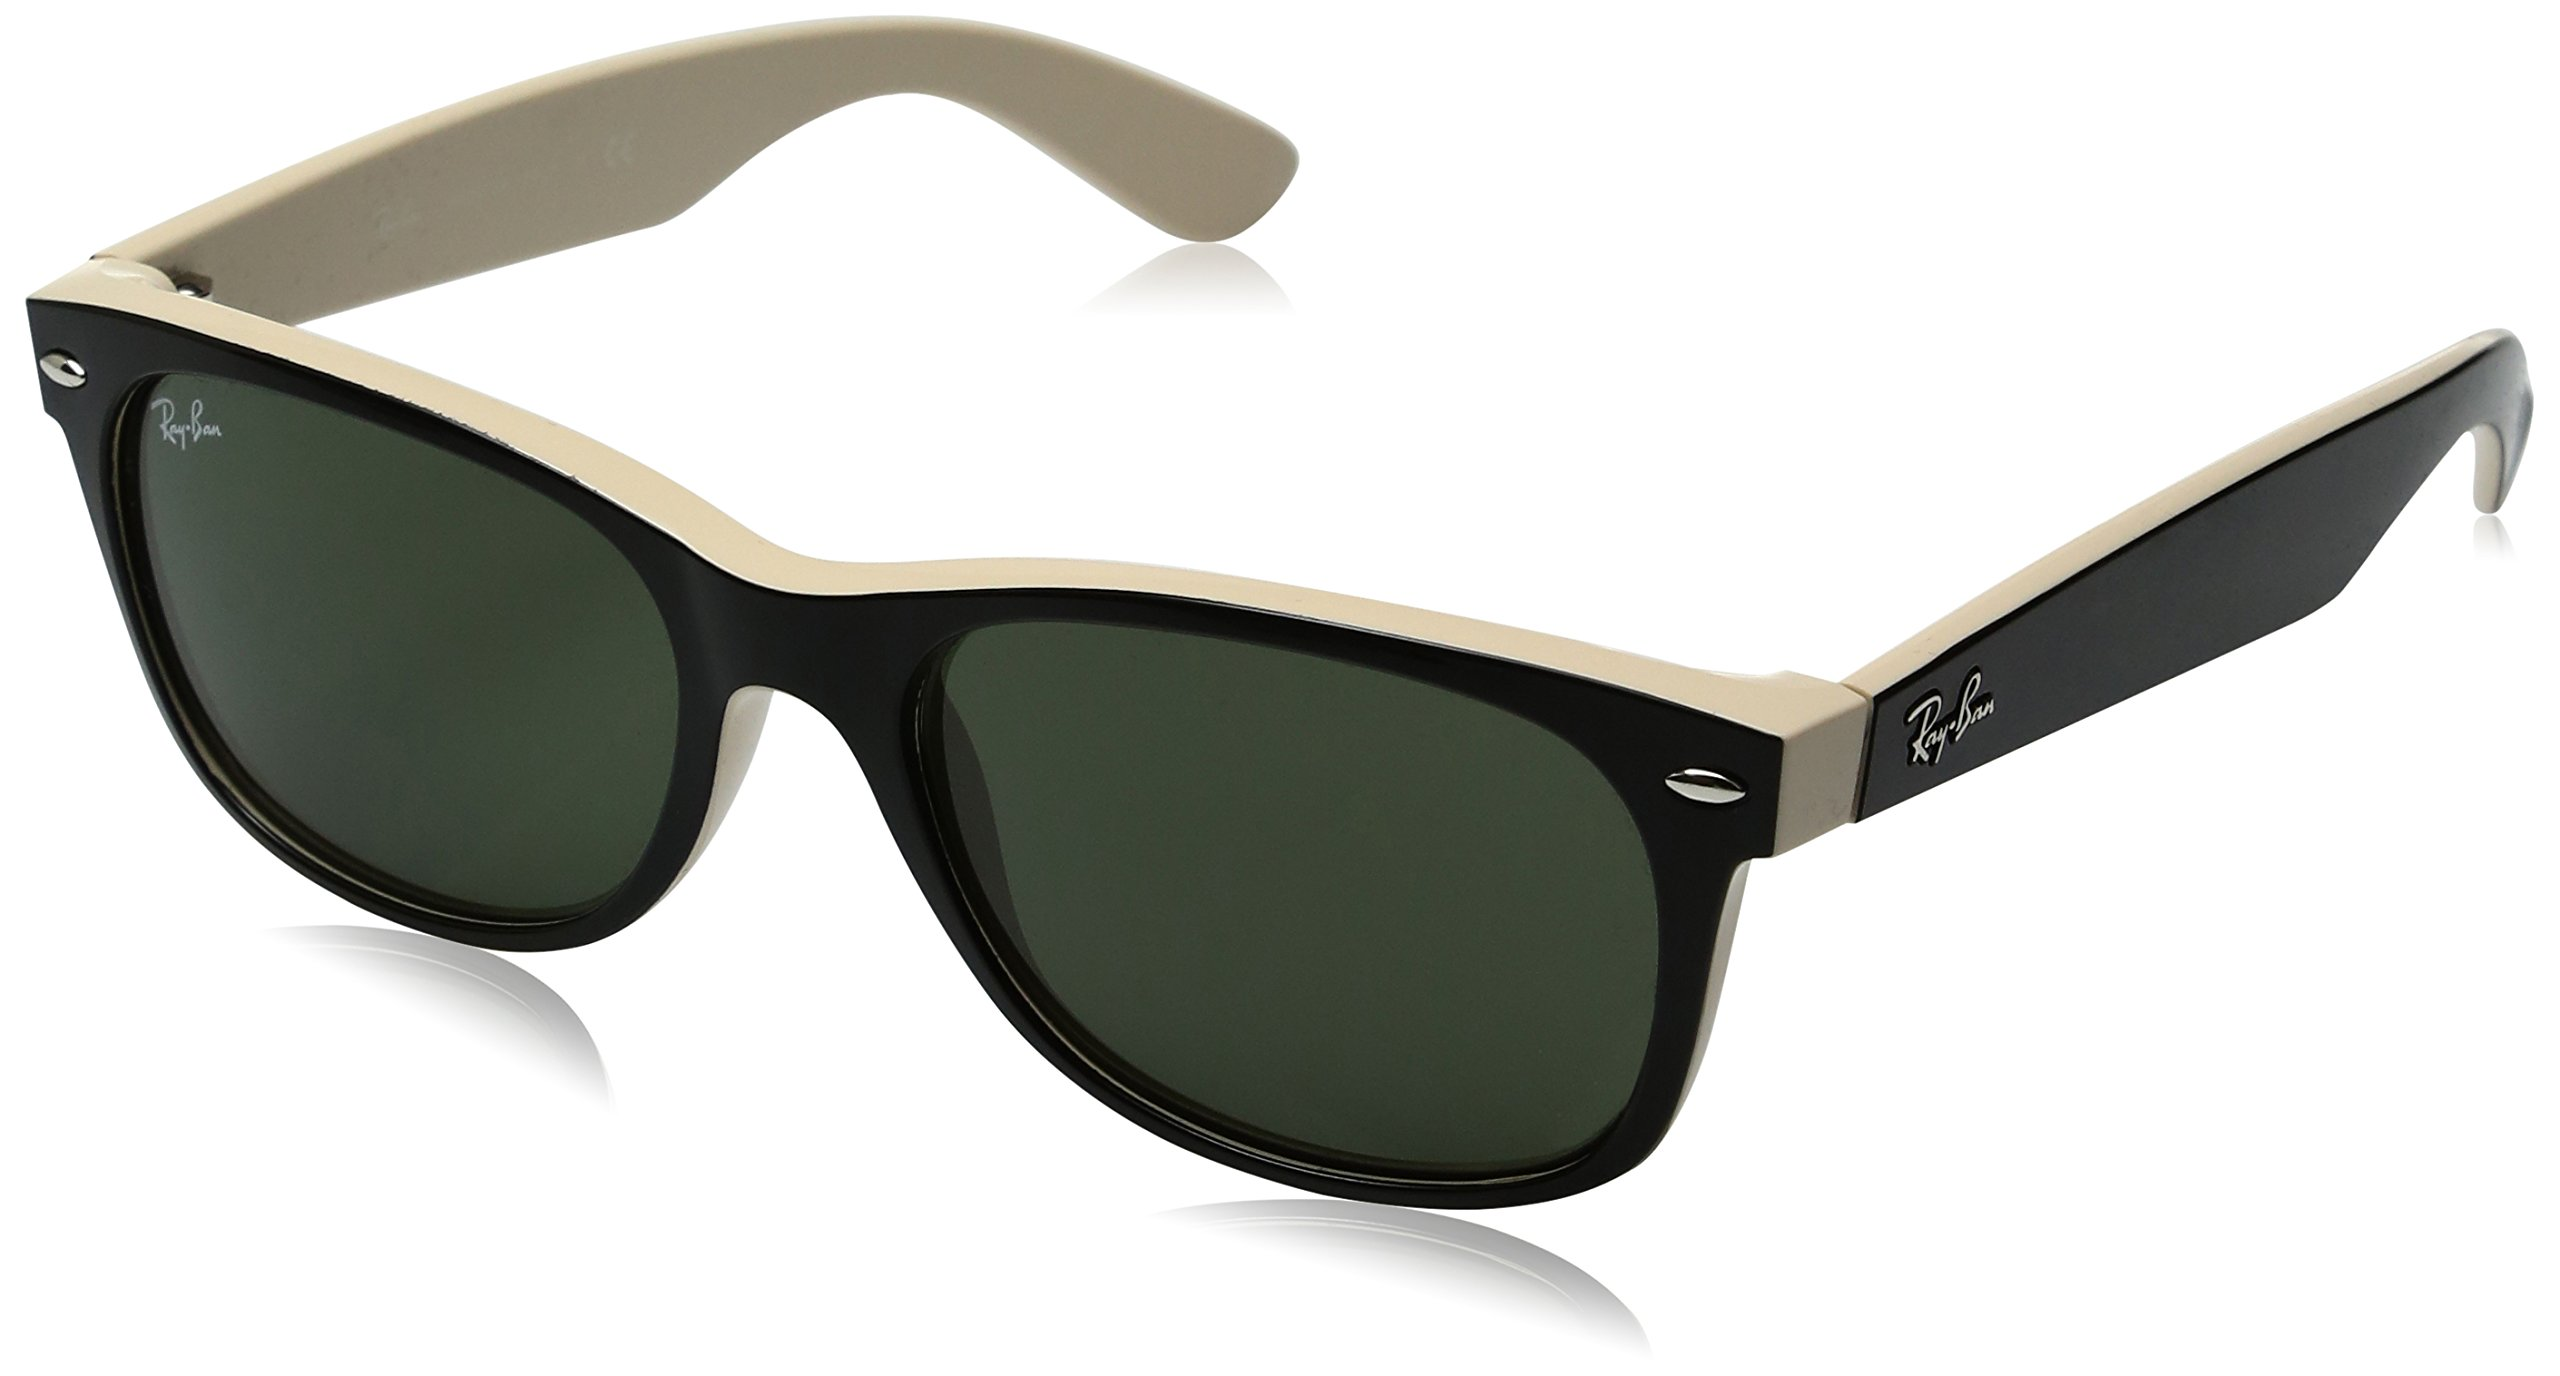 c6165171f798 Ray Ban New Wayfarer Polarized Or Not Sunglasses